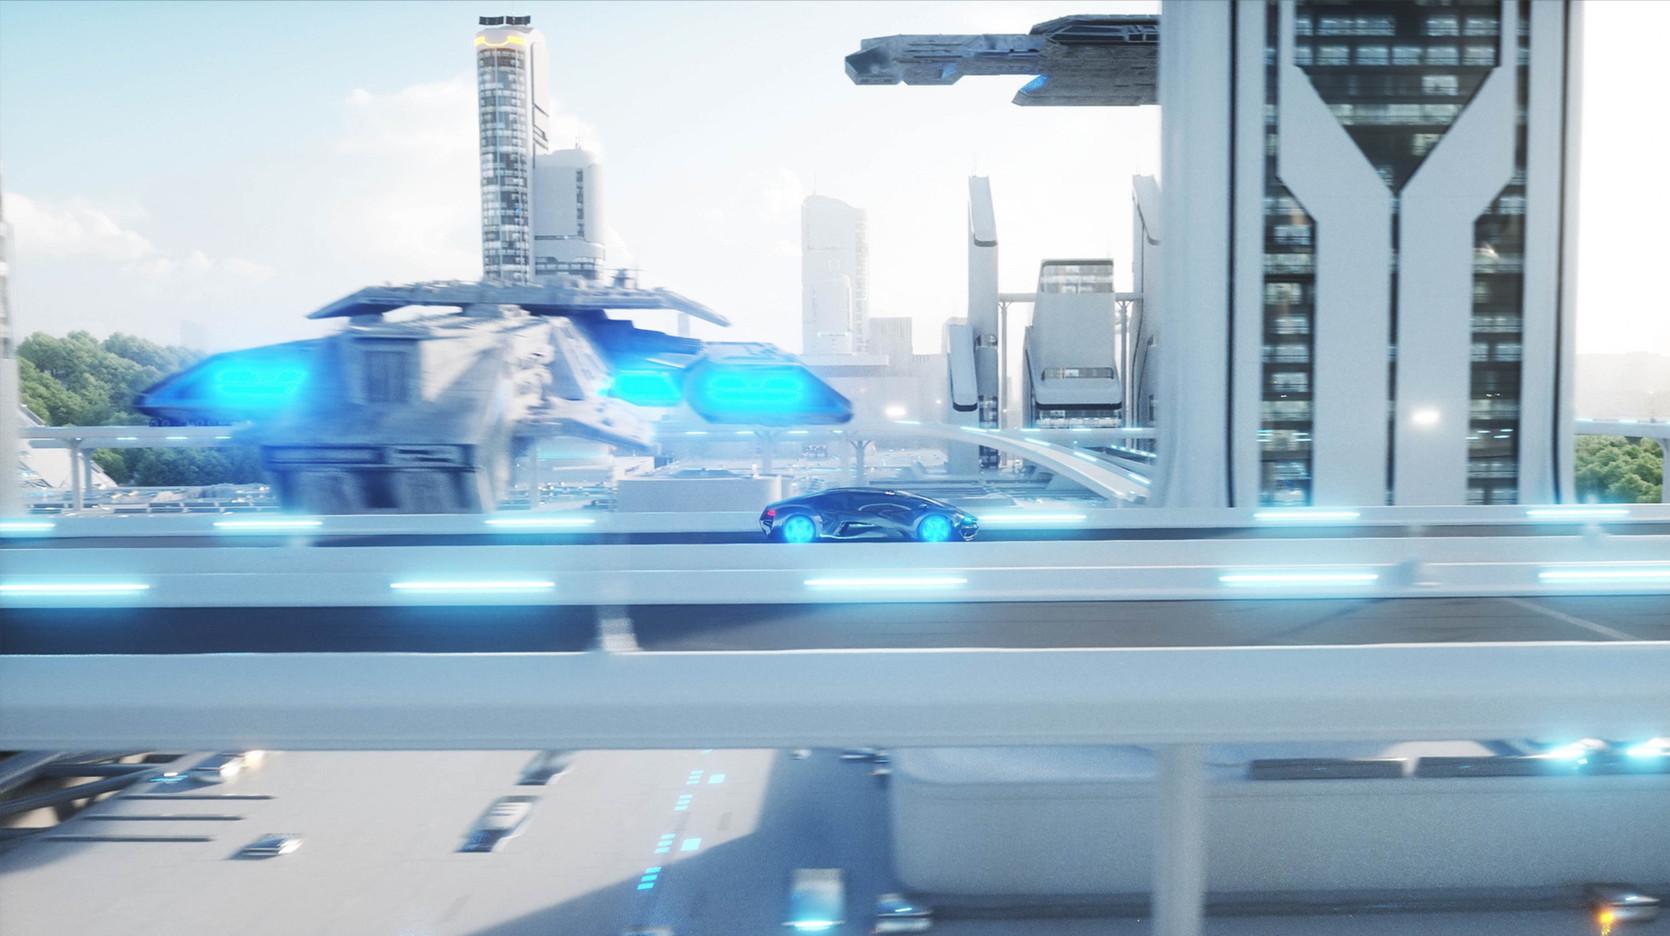 eVo, Product of the Future